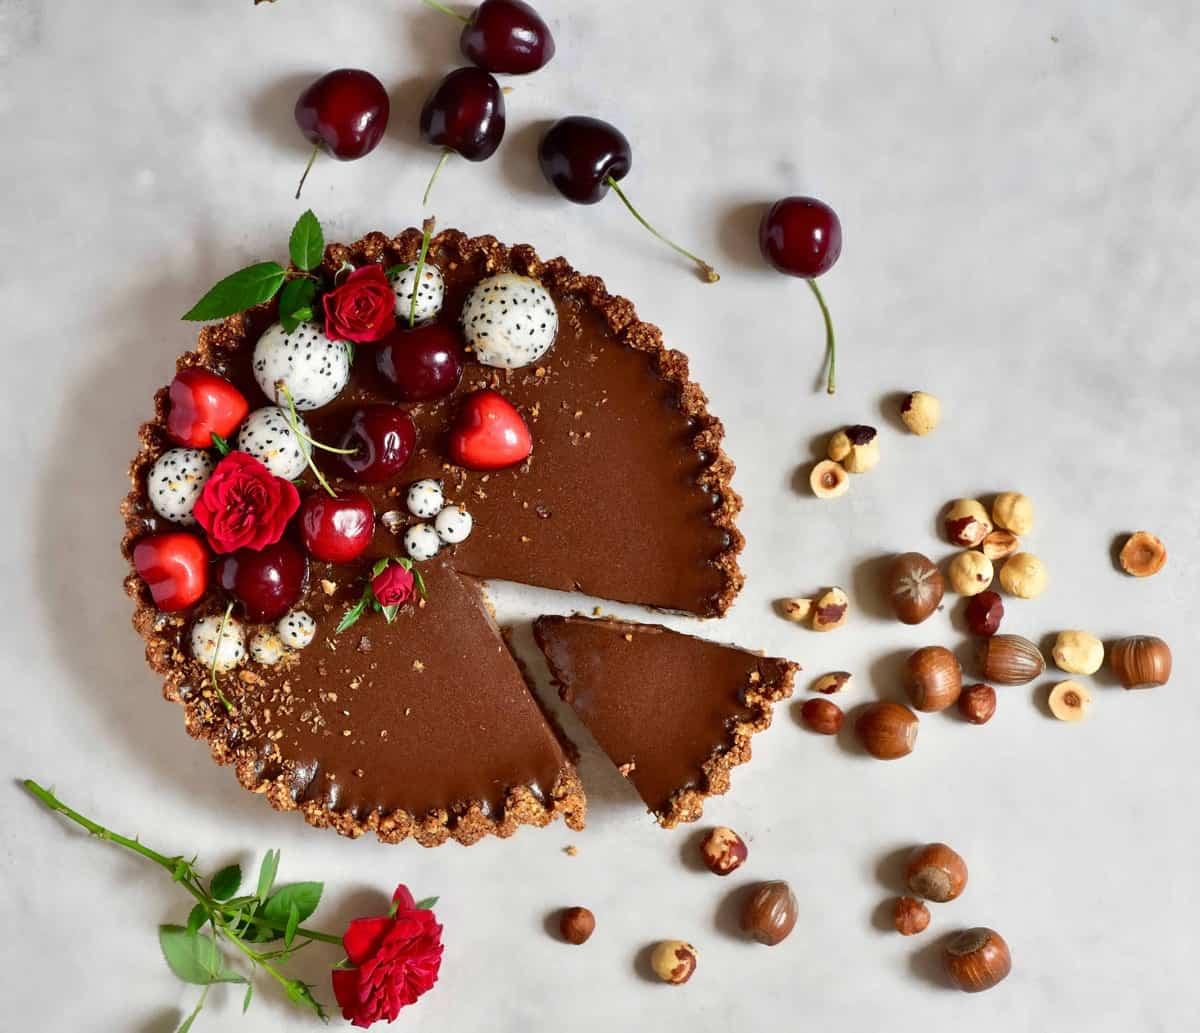 Vegan Chocolate Cherry 'Black Forest' Tart with a hazelnut tart crust